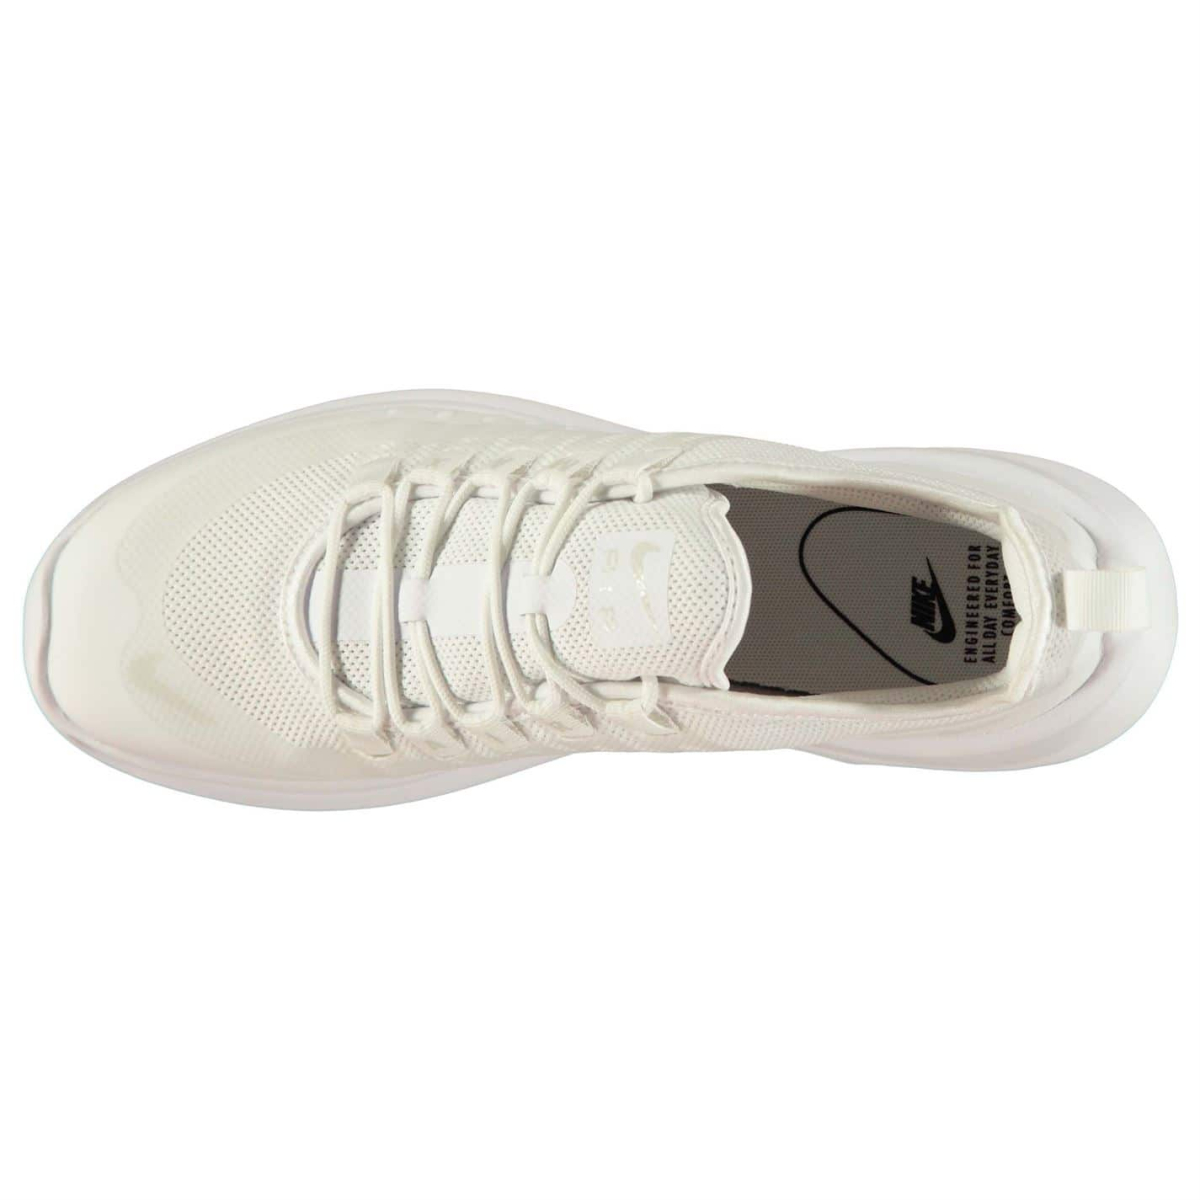 NIKE-Air-Max-Axis-Scarpe-da-ginnastica-Scarpe-da-Corsa-Uomo-Sneaker-Scarpe-Sportive-Fitness-1313 miniatura 39